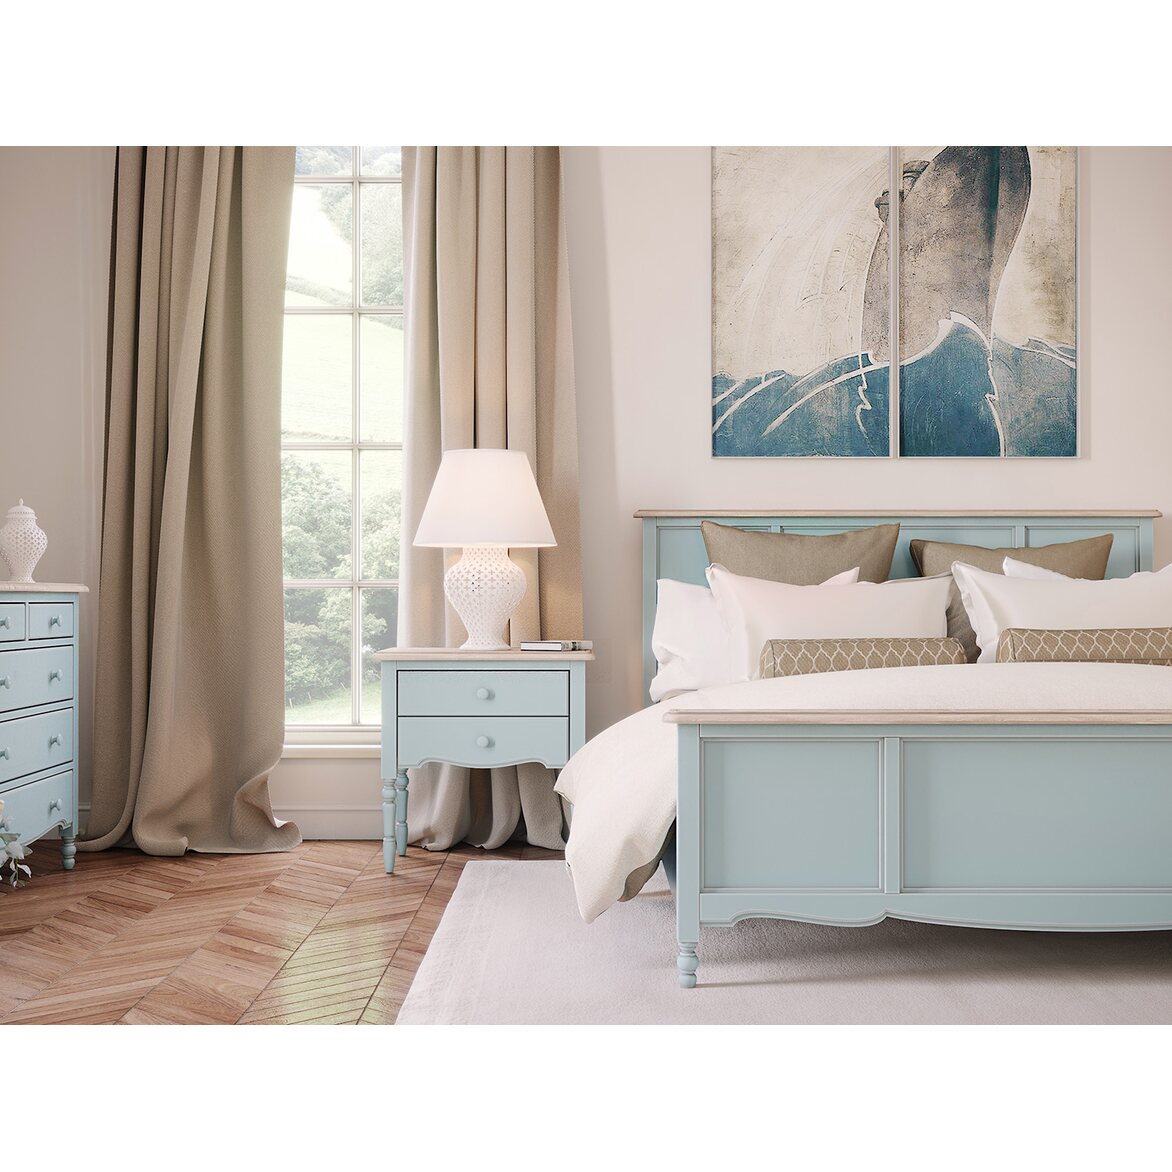 Буфет двухстворчатый с 4-я ящиками Leblanc, голубой 4 | Буфеты Kingsby